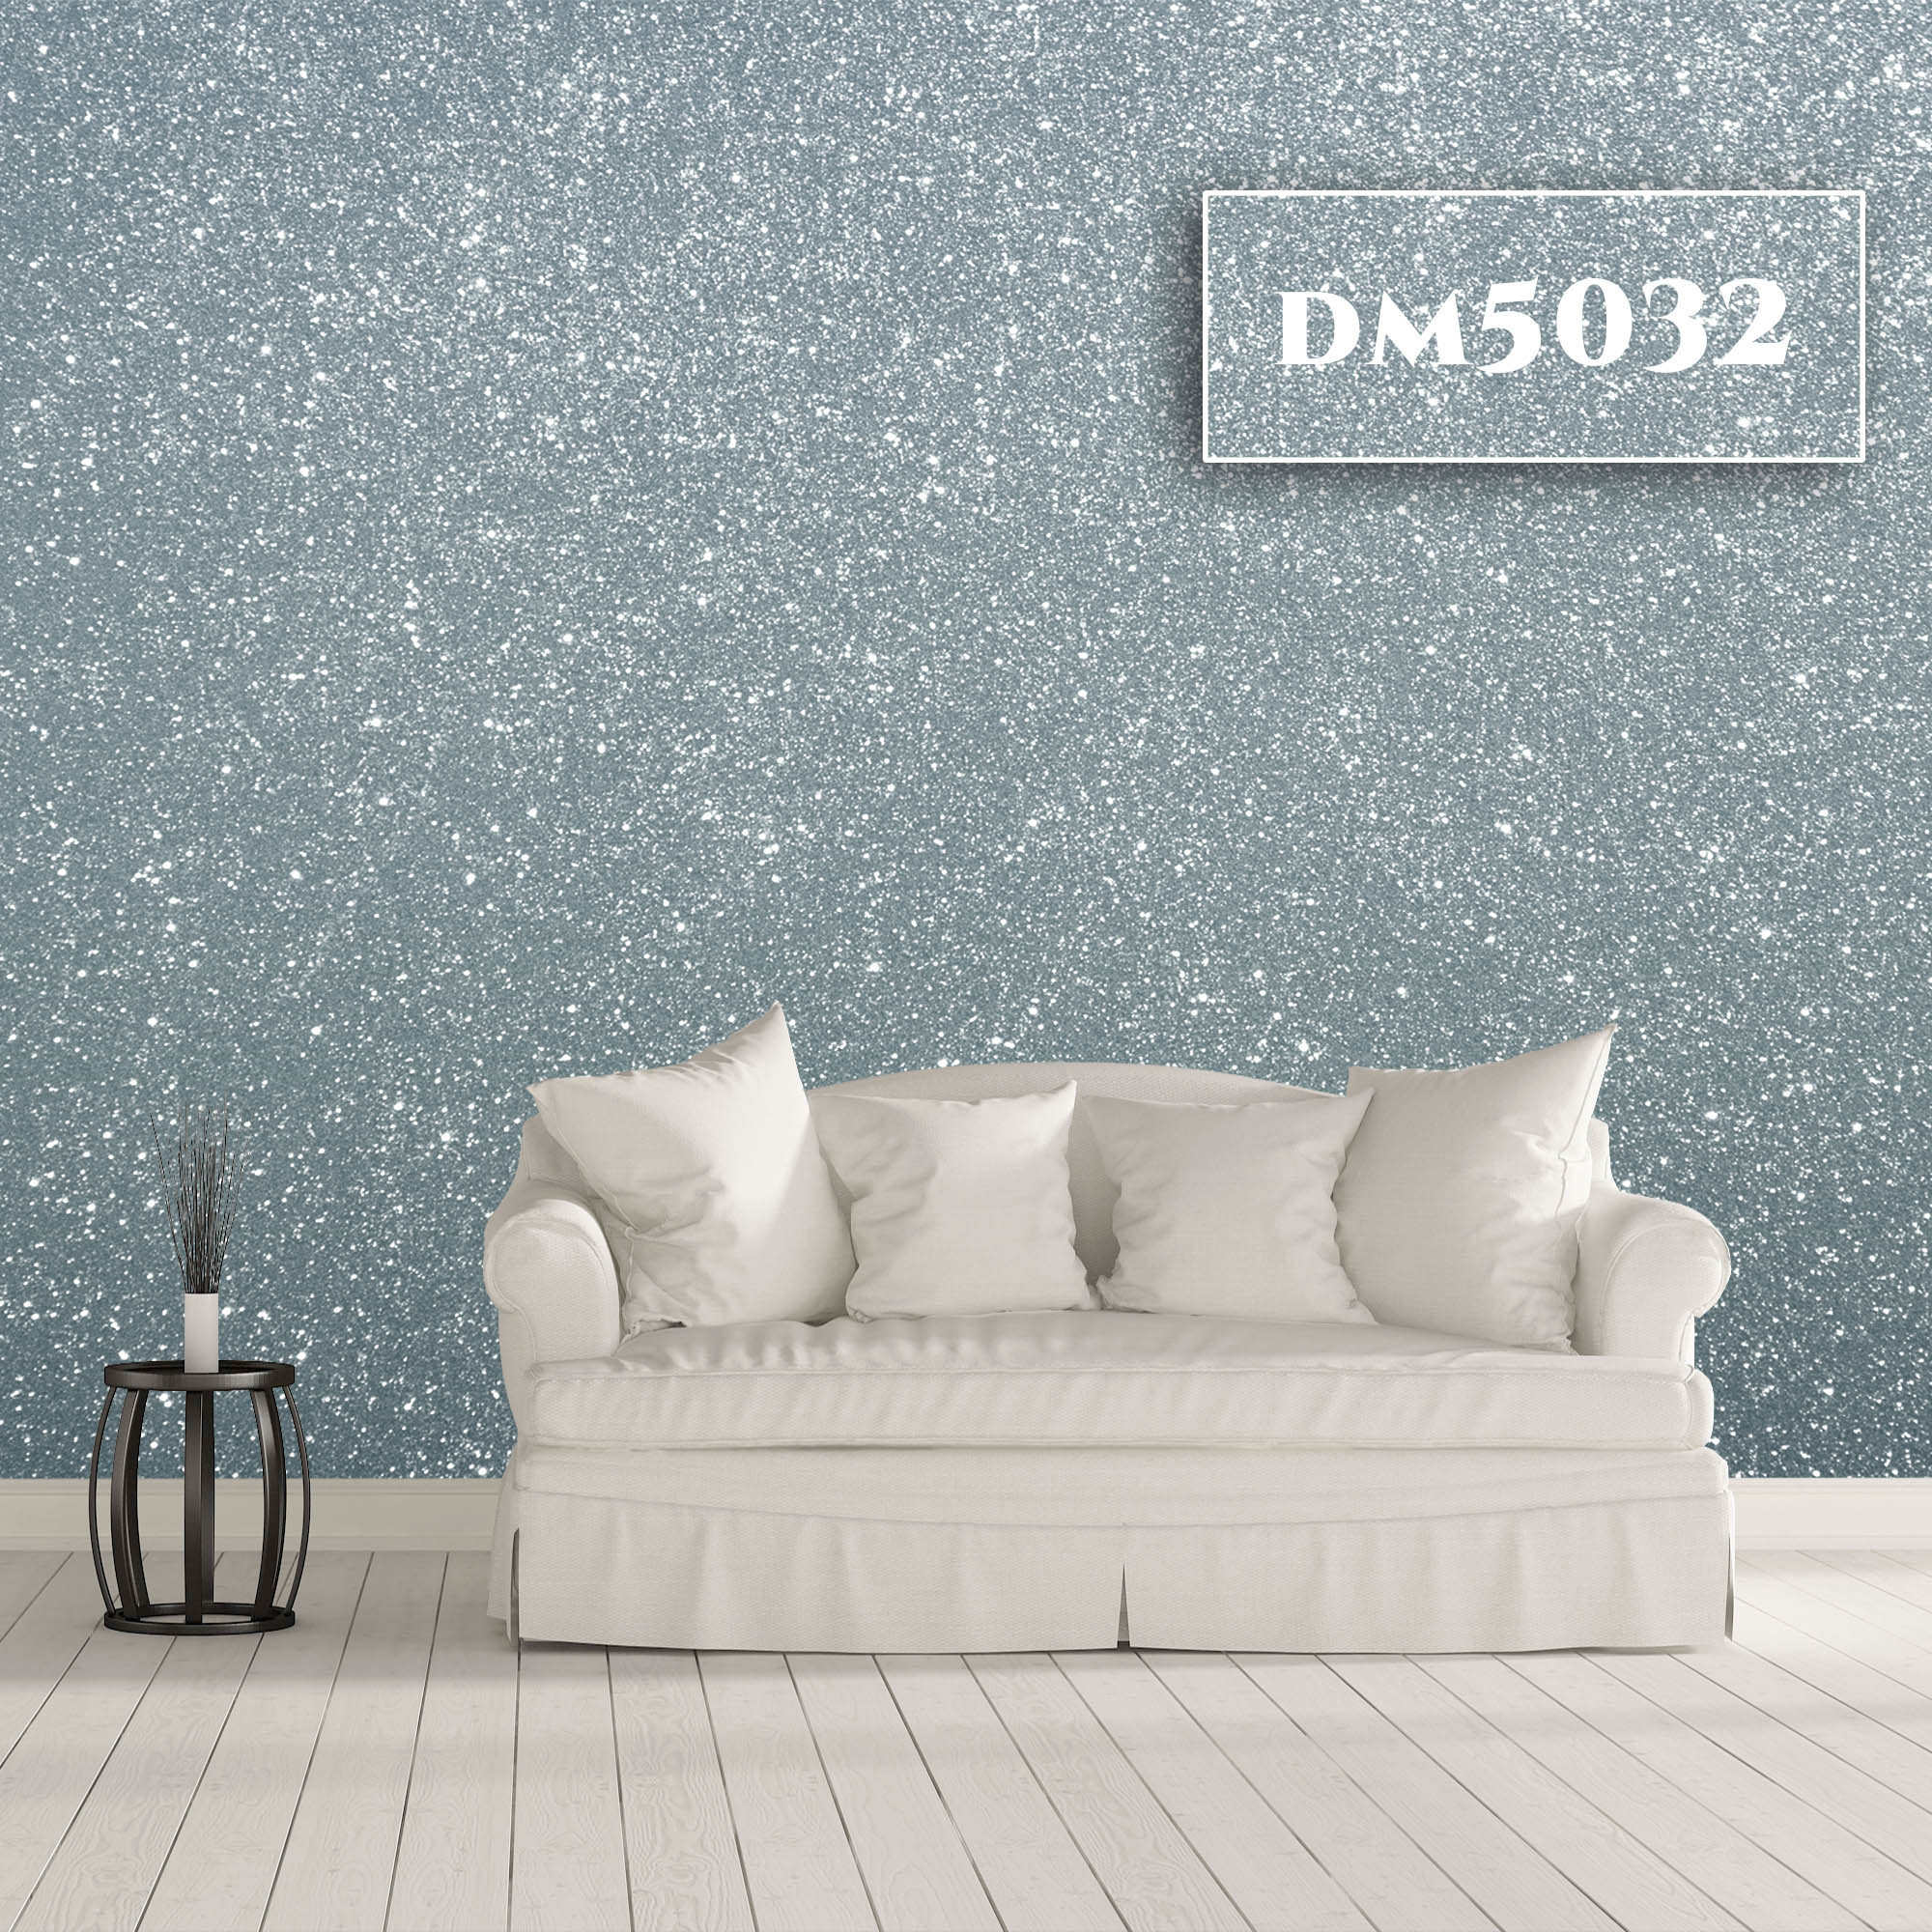 dm5032